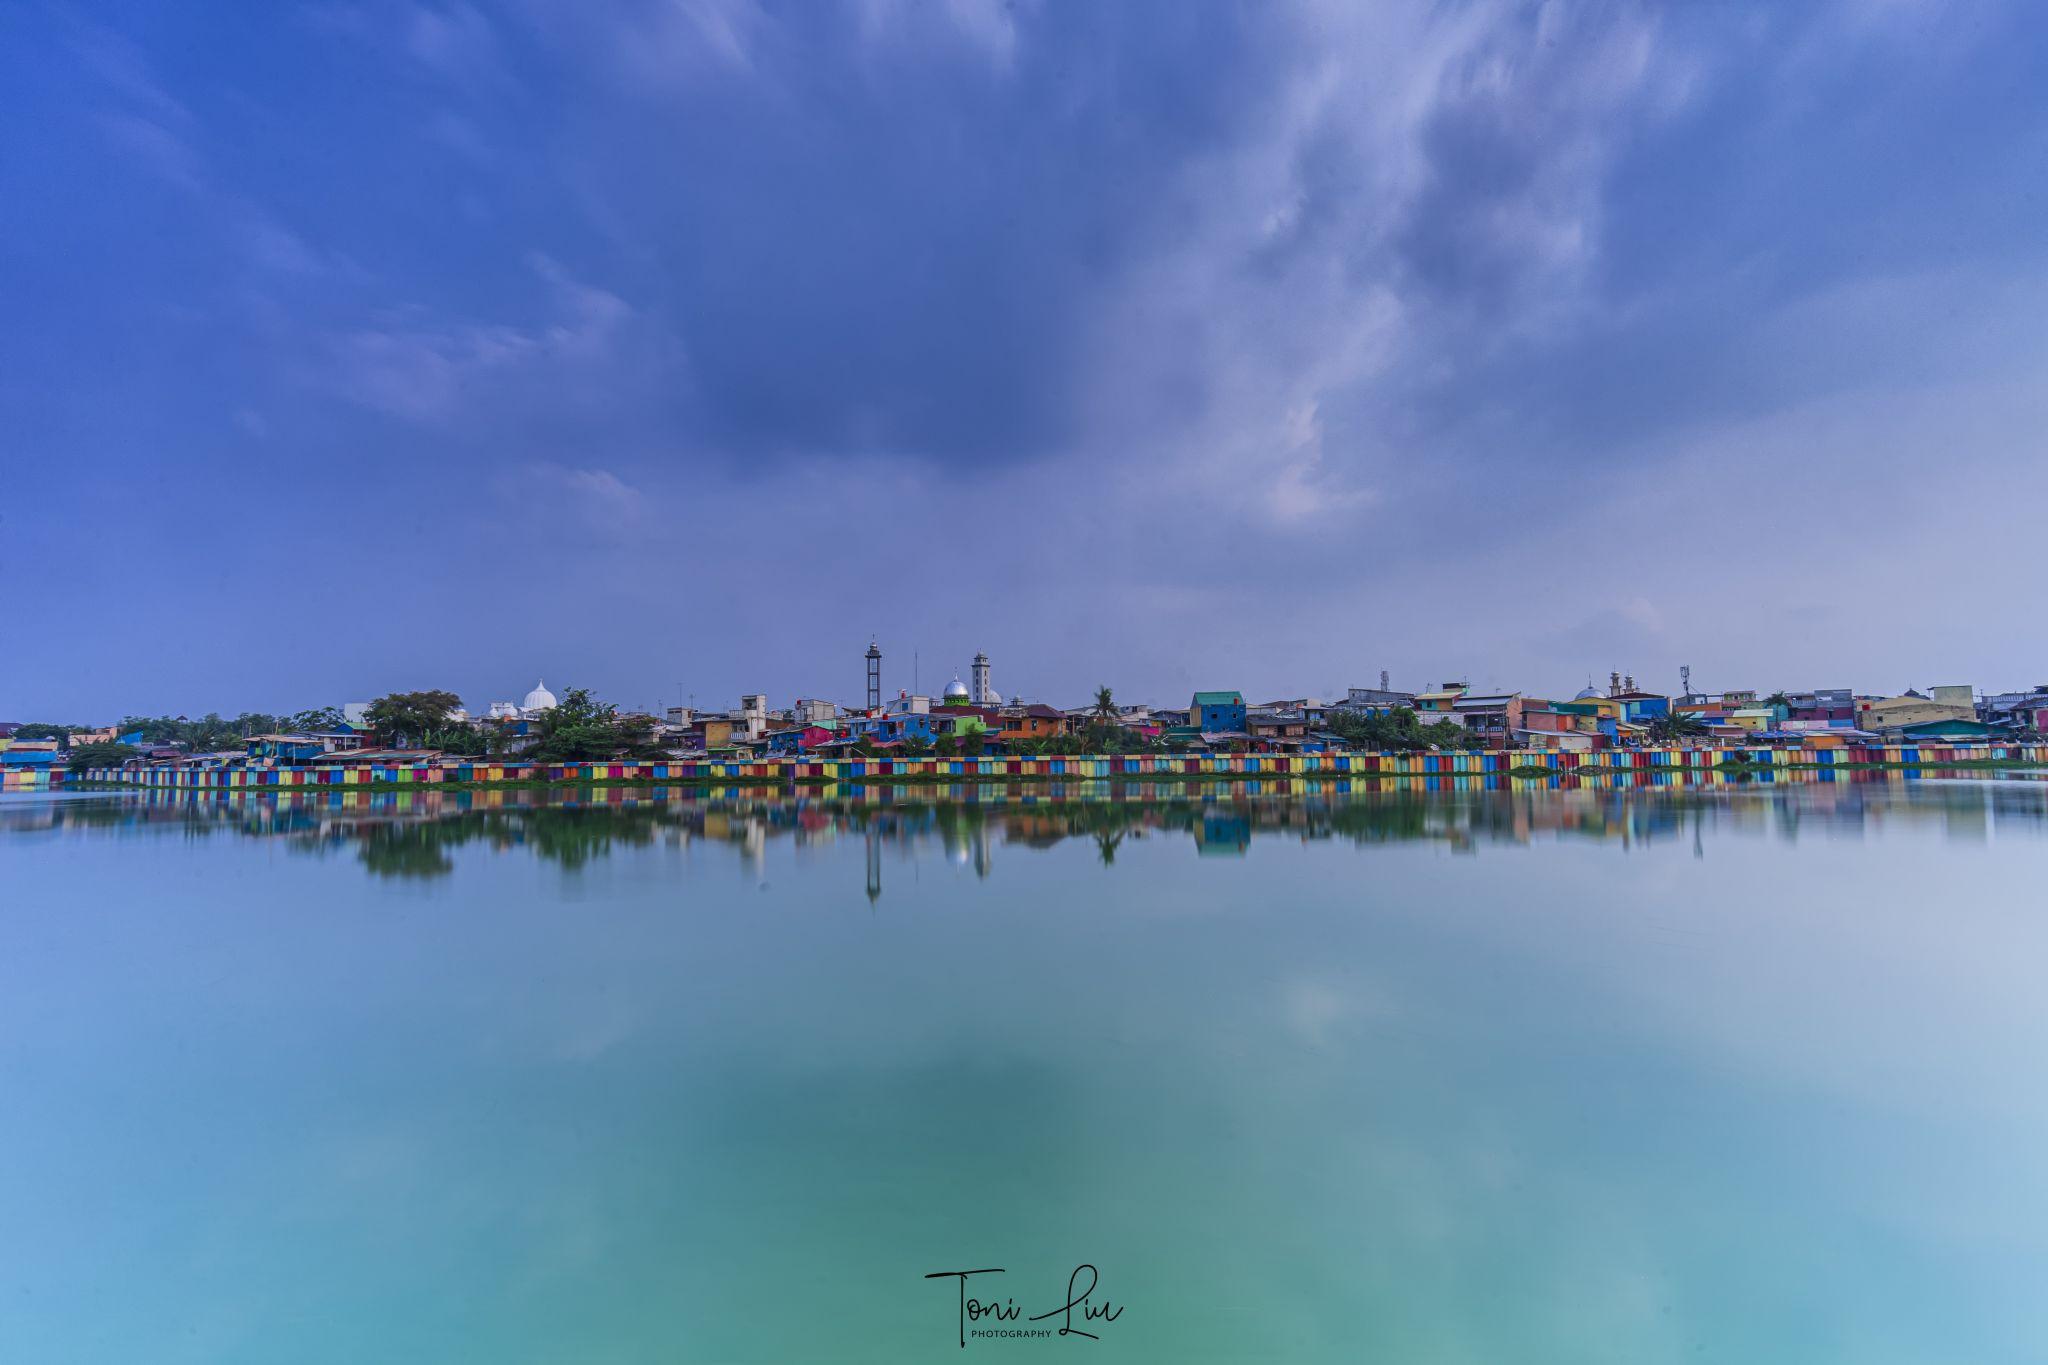 Danau Sunter (Sunter Lake), Indonesia